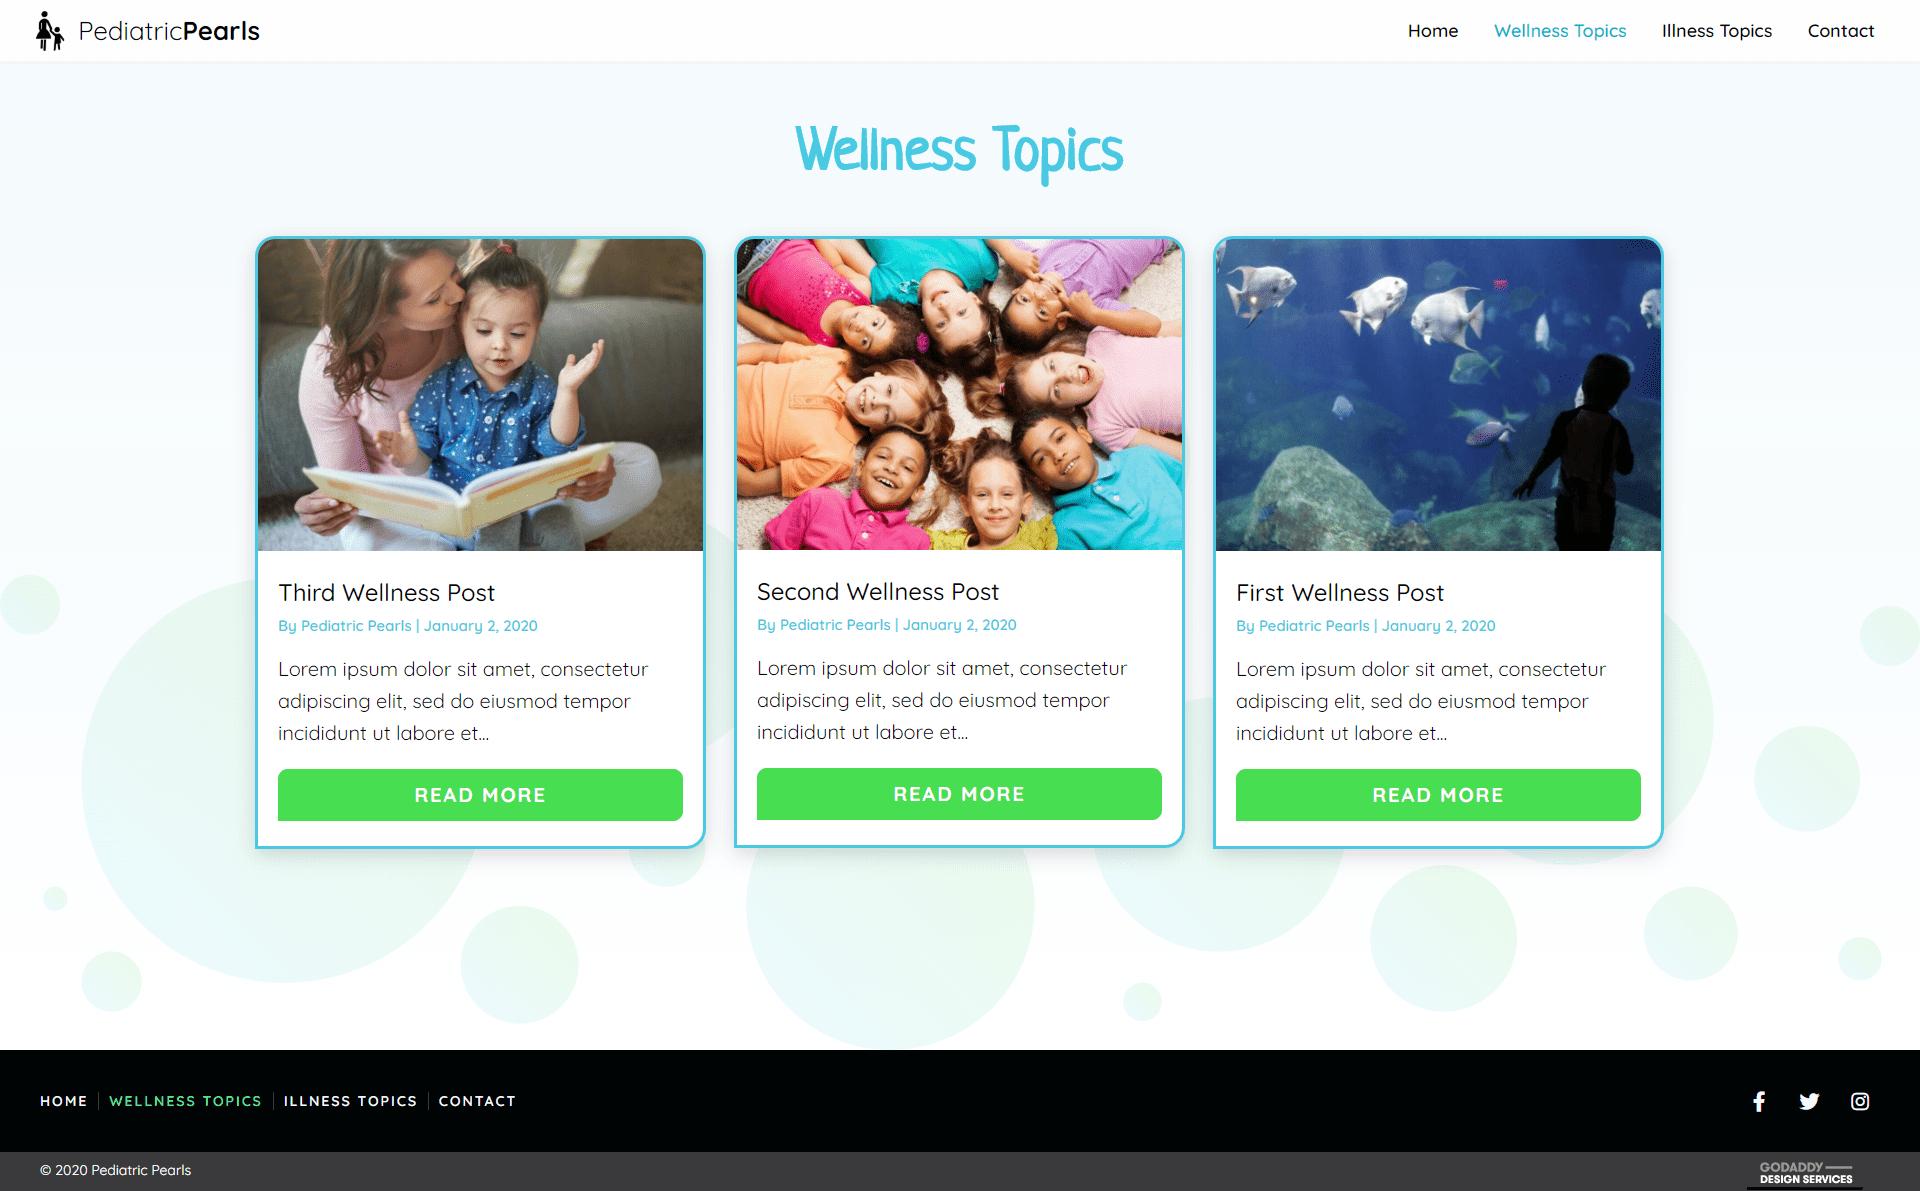 screencapture-qnt-818-myftpupload-category-wellness-topics-